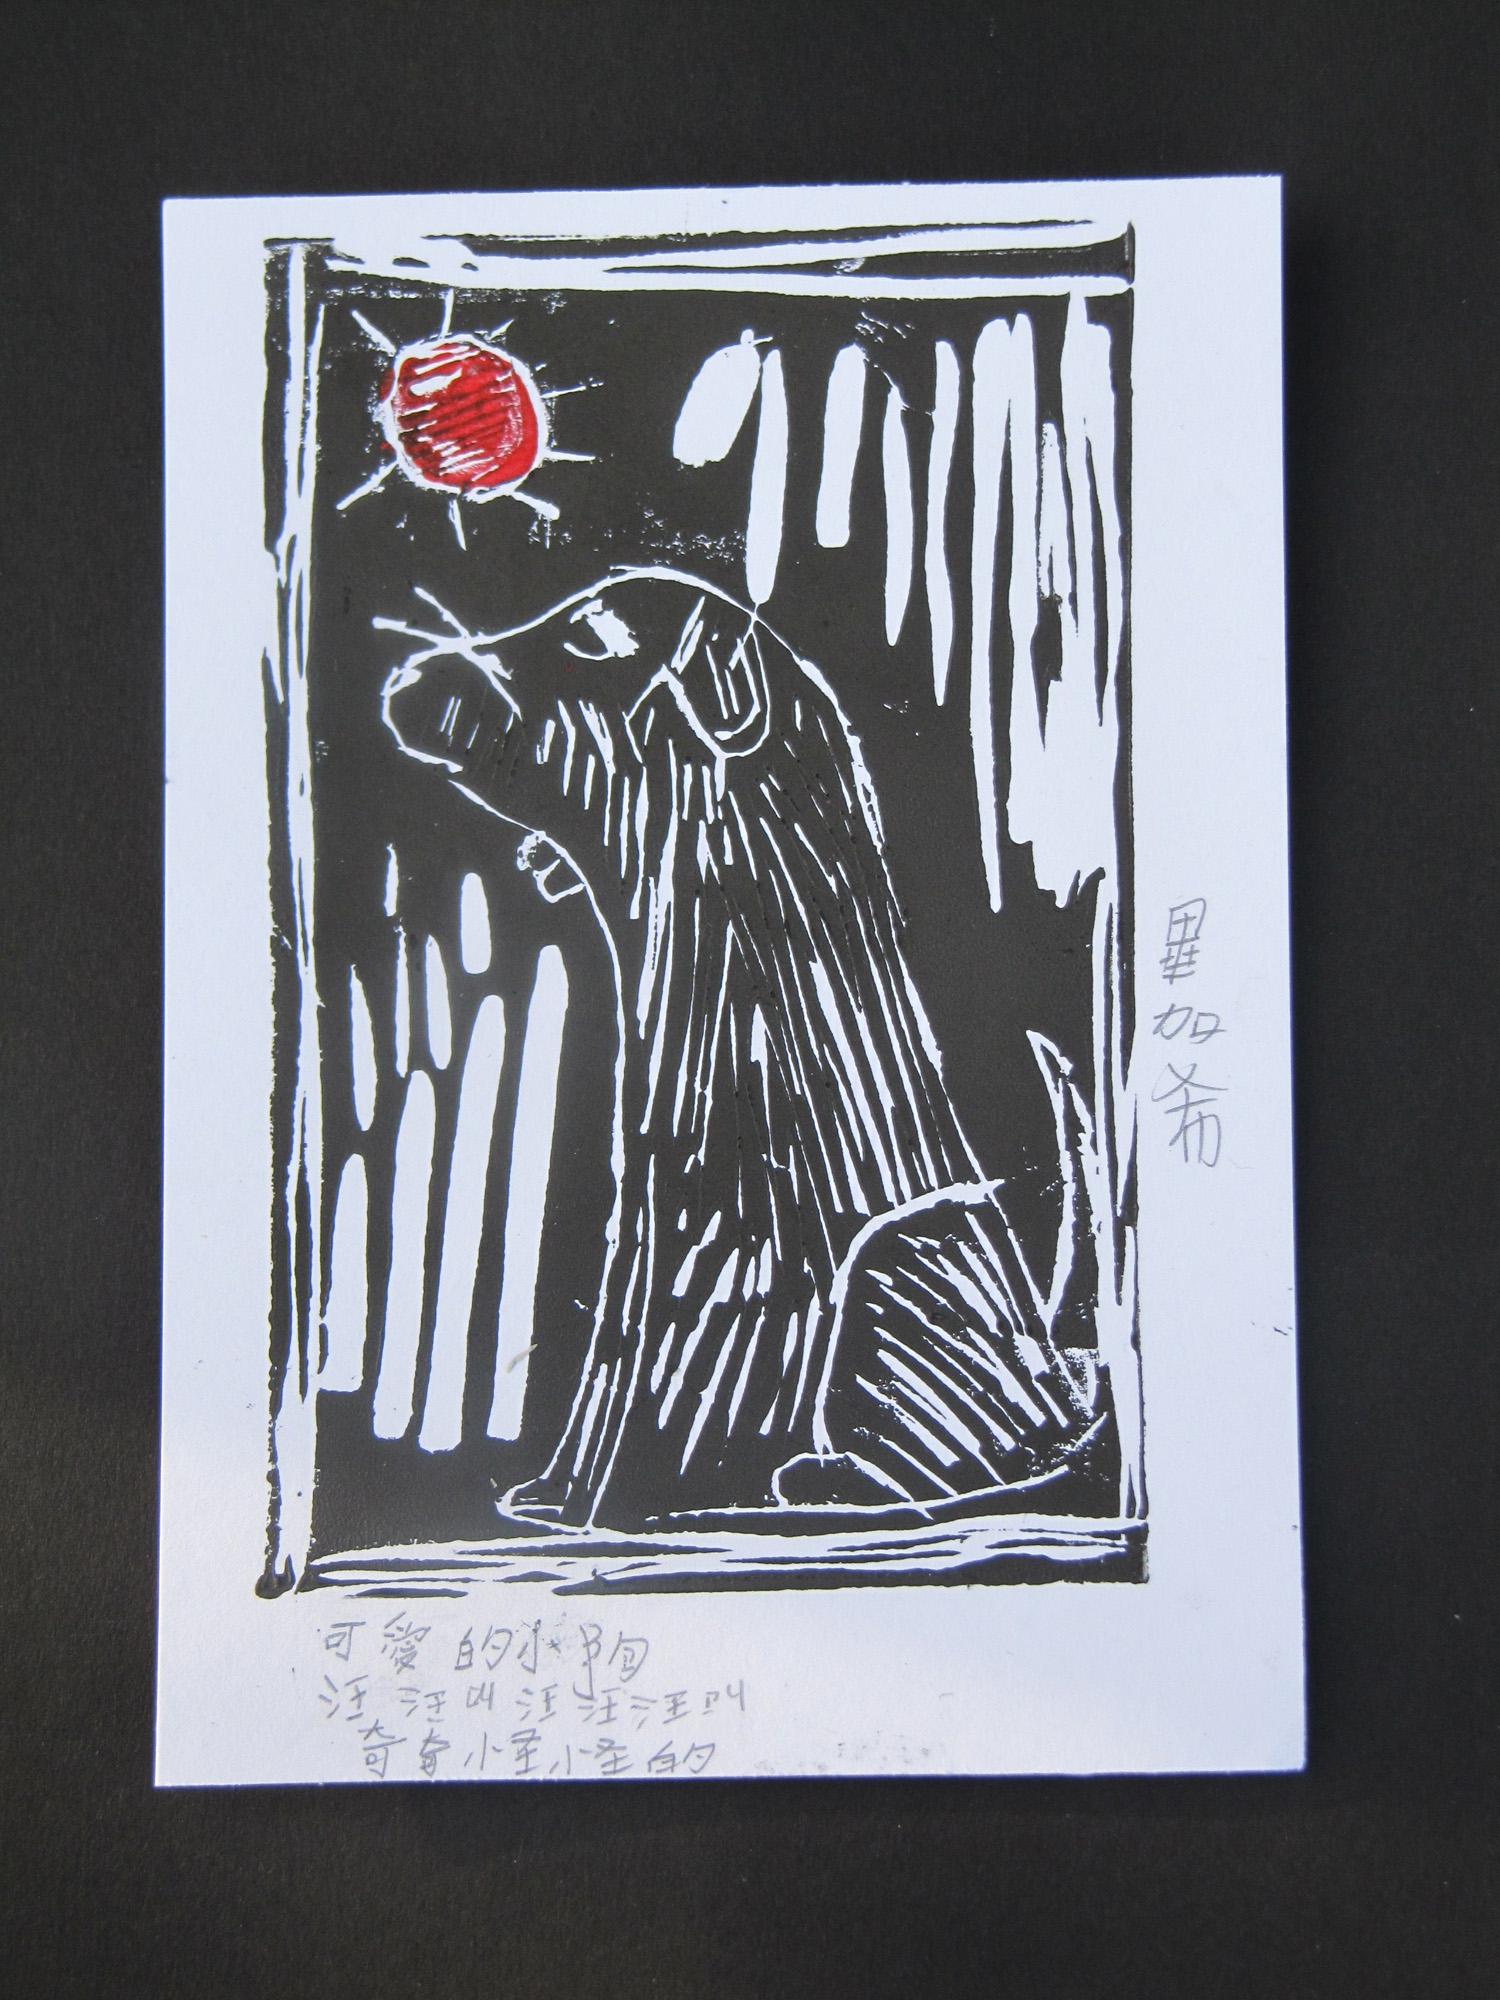 CLIP Art.2010.Lawson 045.jpg